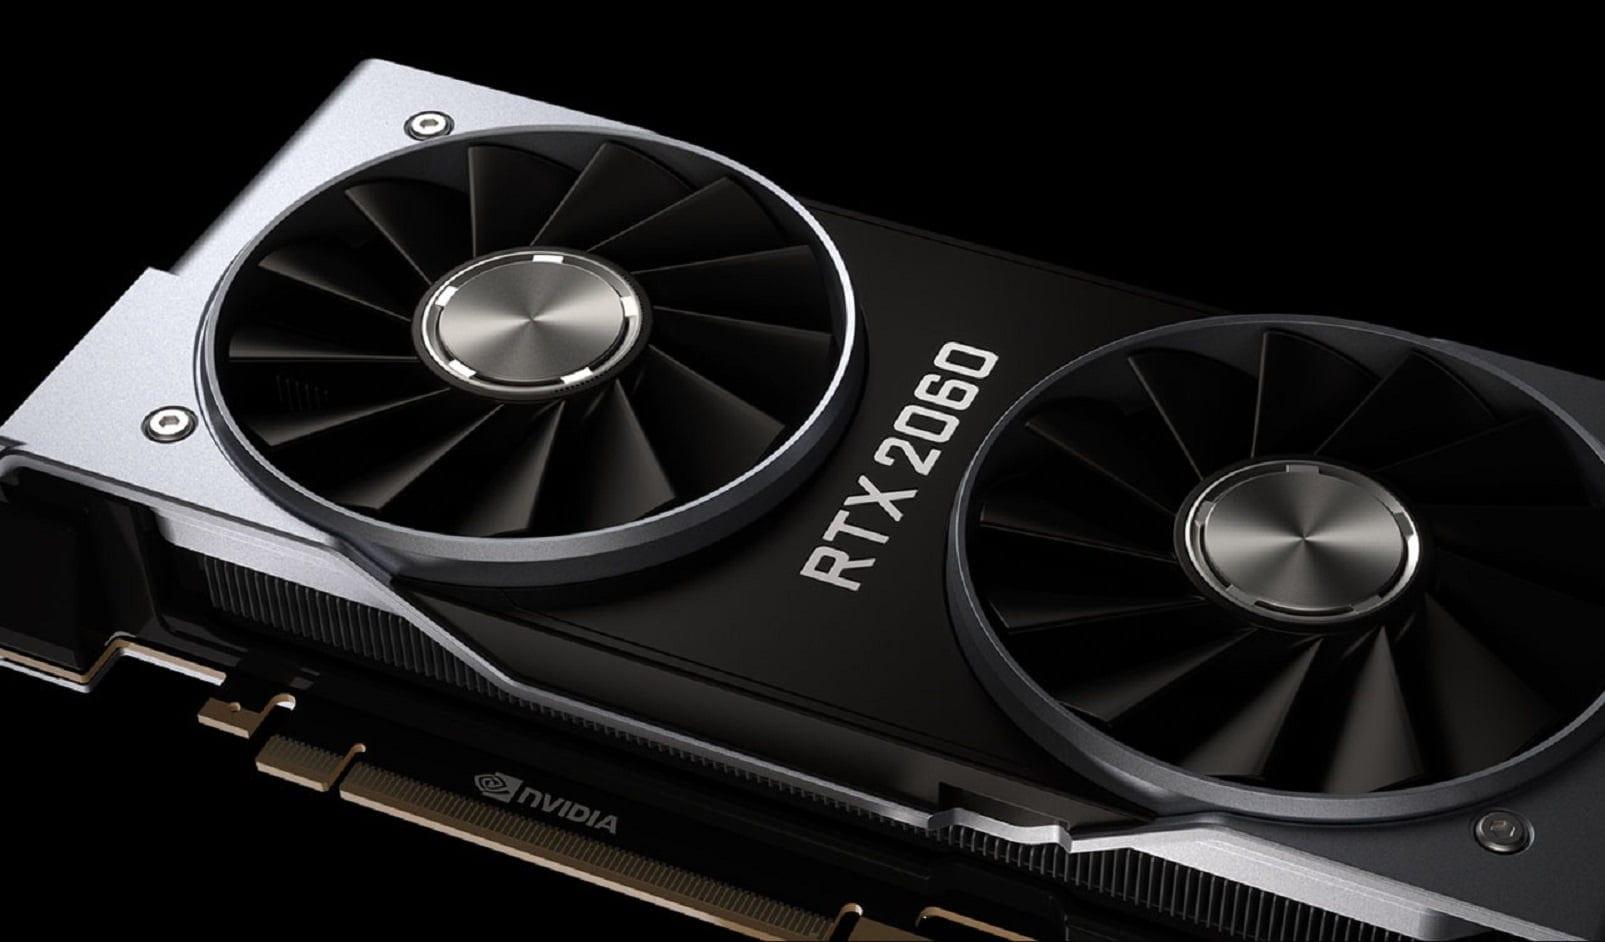 NVIDIA официально снизила цену на видеокарту GeForce RTX 2060 до 299 долларов